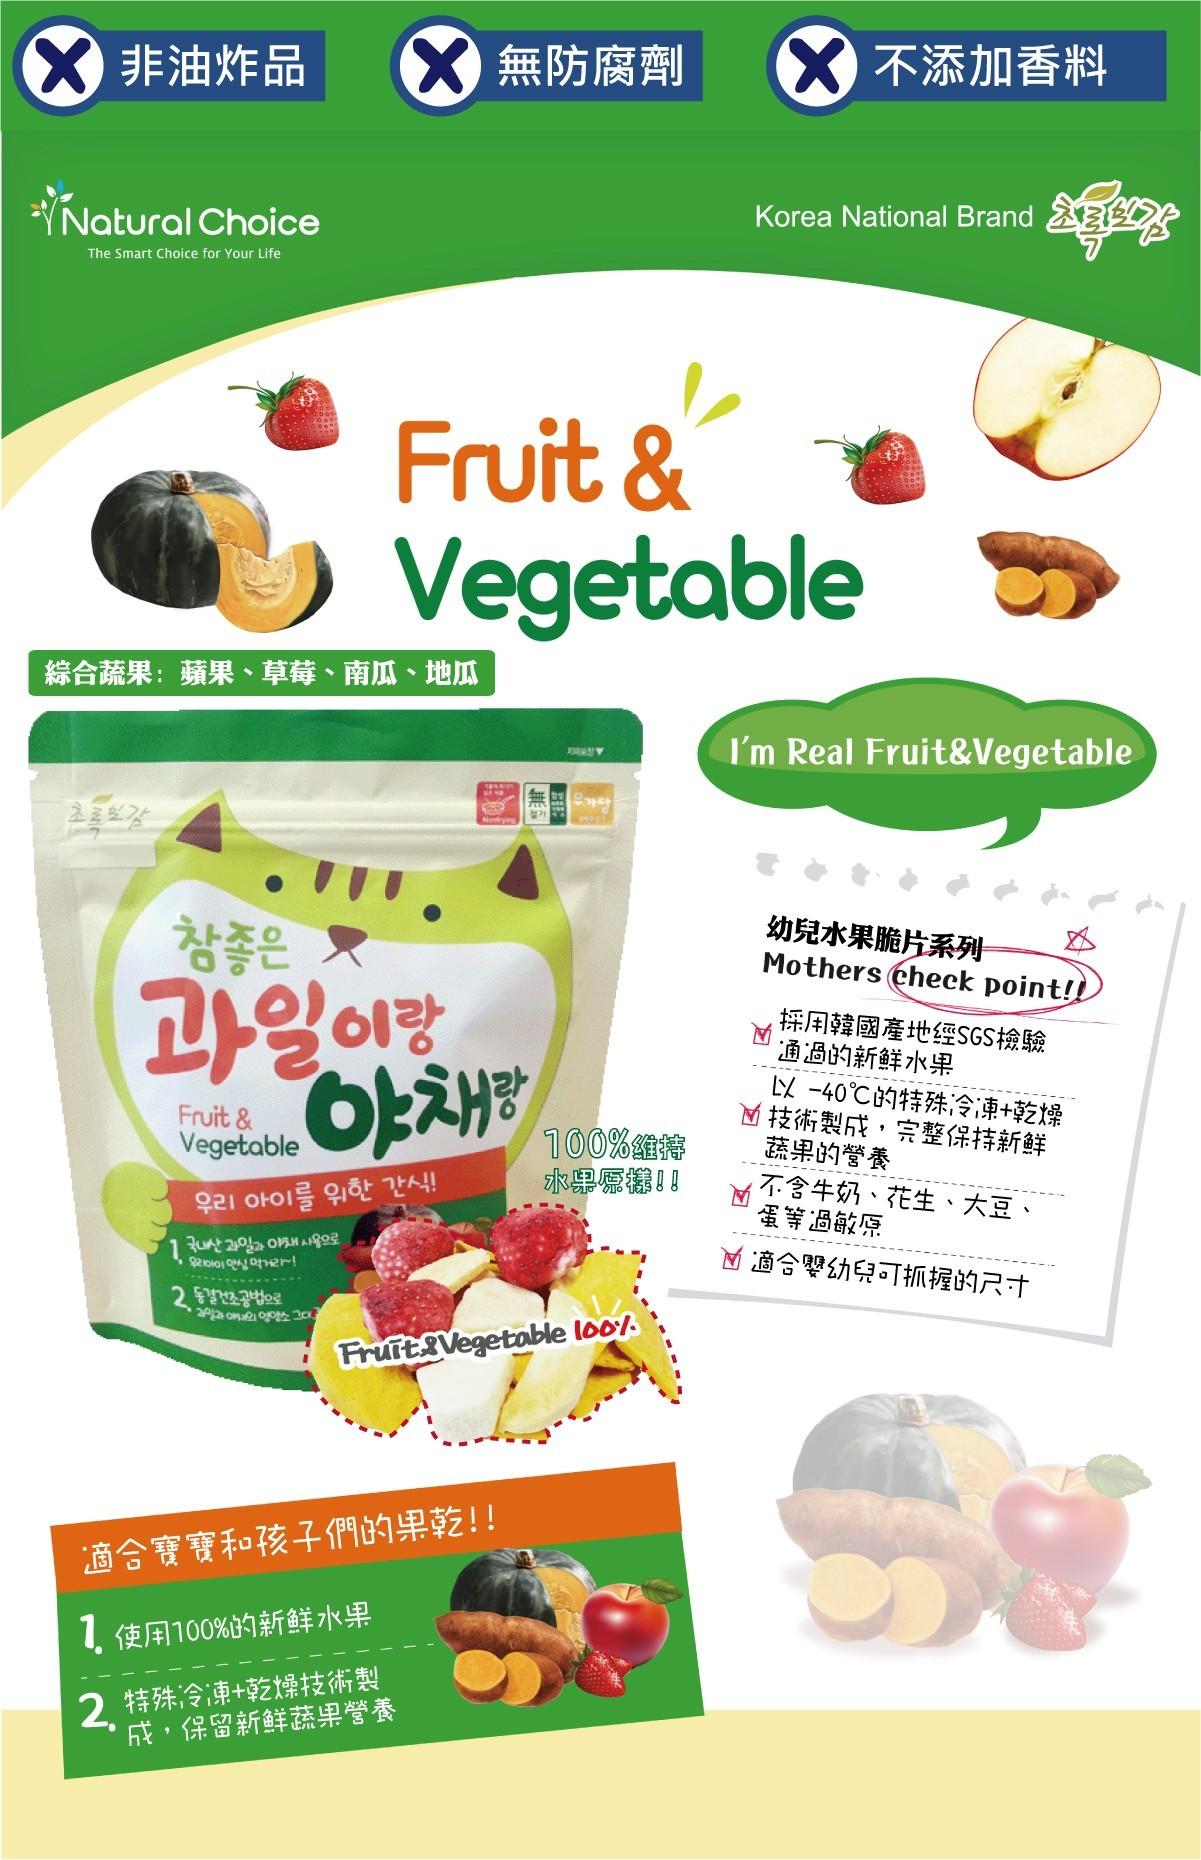 【Natural Choice】韓國自然首選水果脆片精選全組合6入組